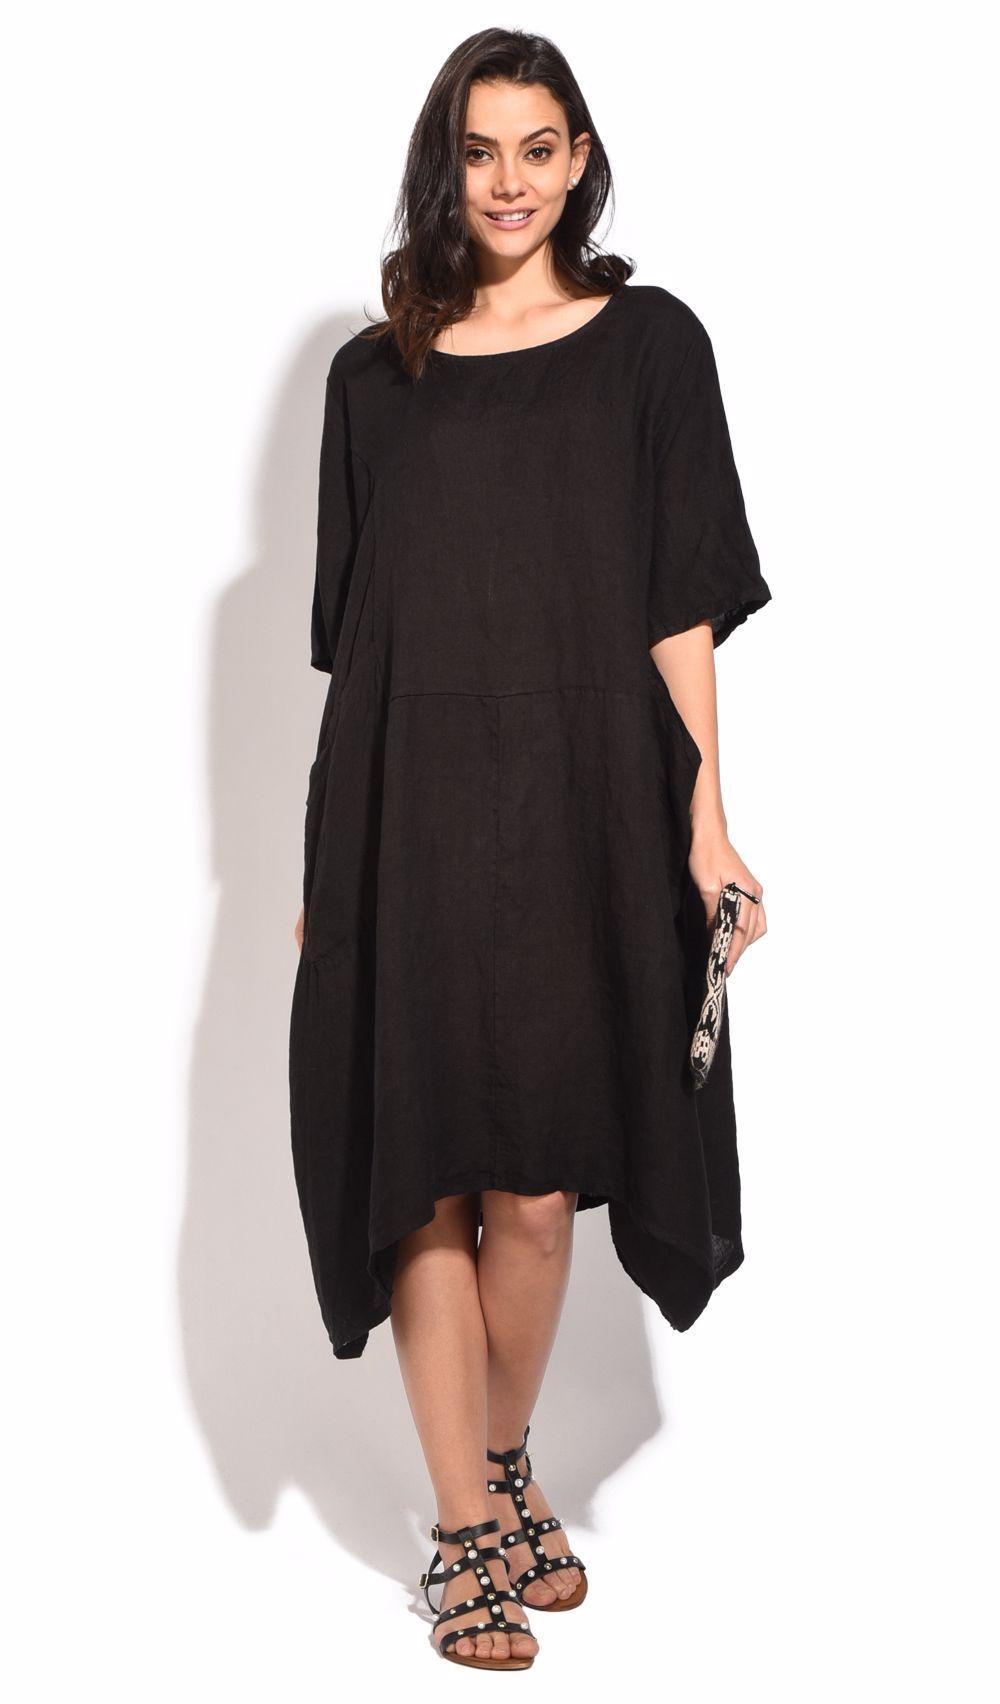 651626c5c7 Glow: bias cut silk slip dress in 4 colors in 2019 | Clothes | Silk slip,  Dresses, Silk